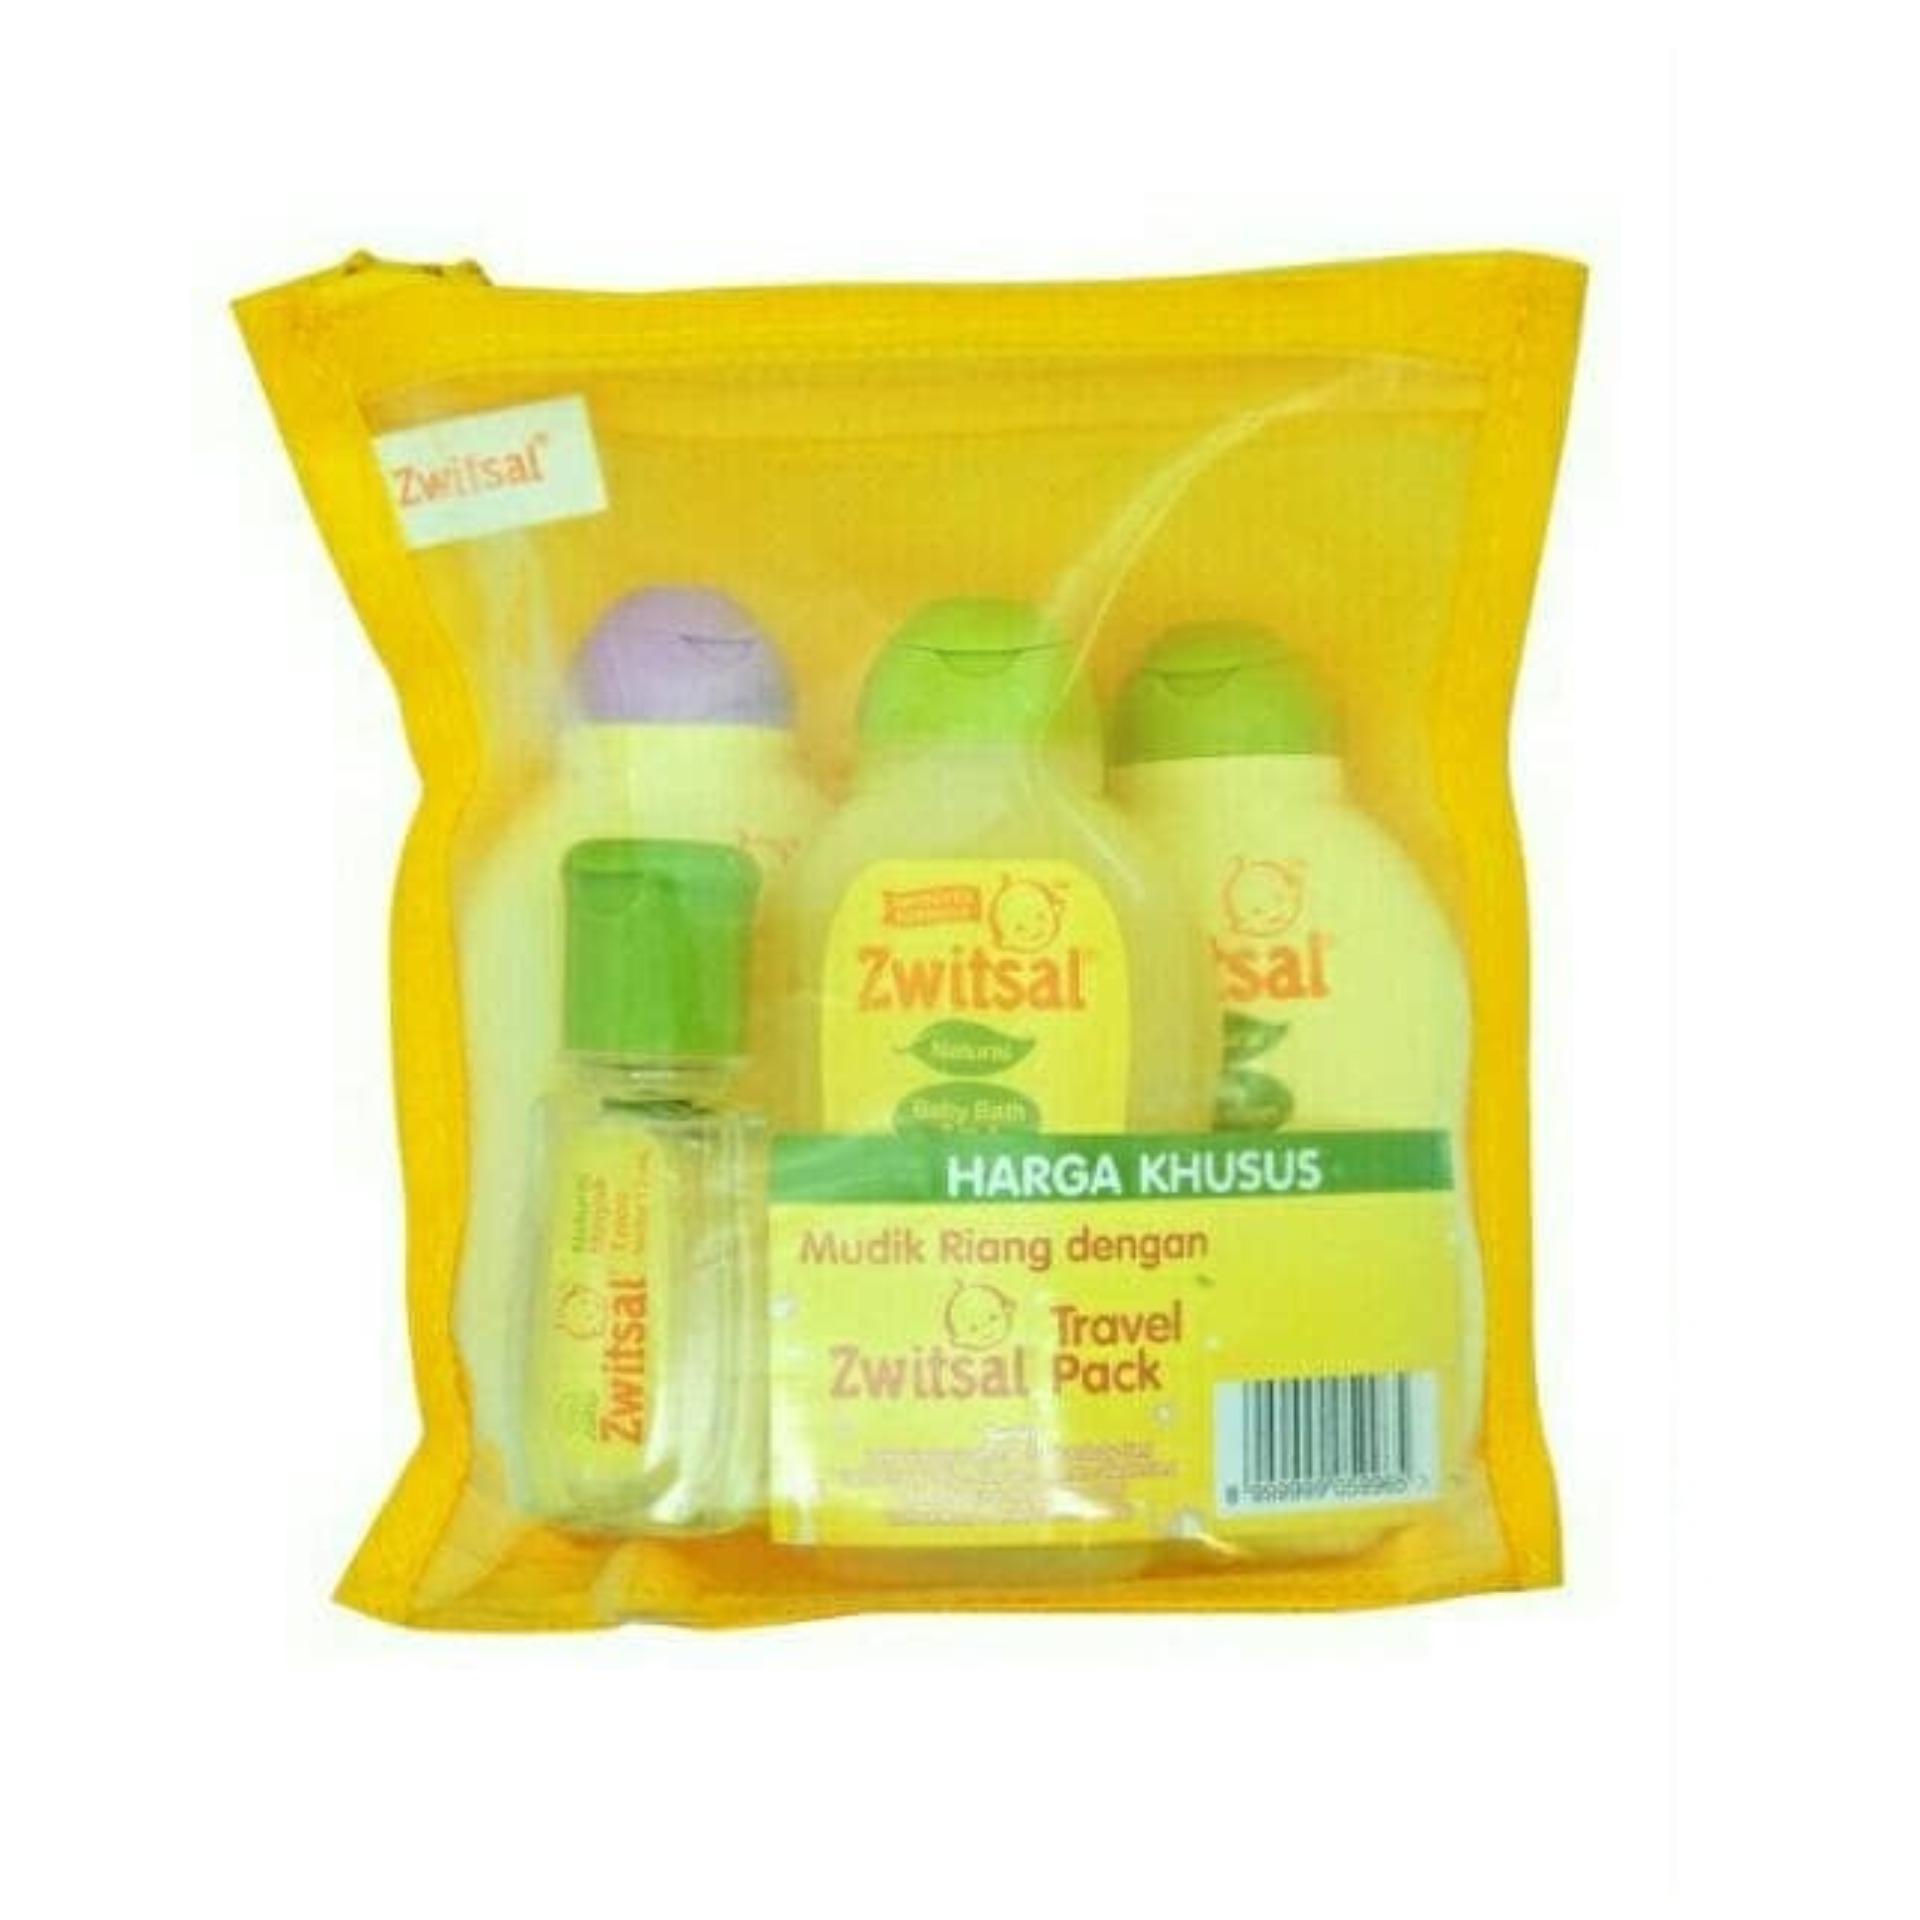 Diskon Zwitsal Baby Oil Natural 100ml Twin Pack Toko Cream Extra Care Zinc 100 Ml Travel